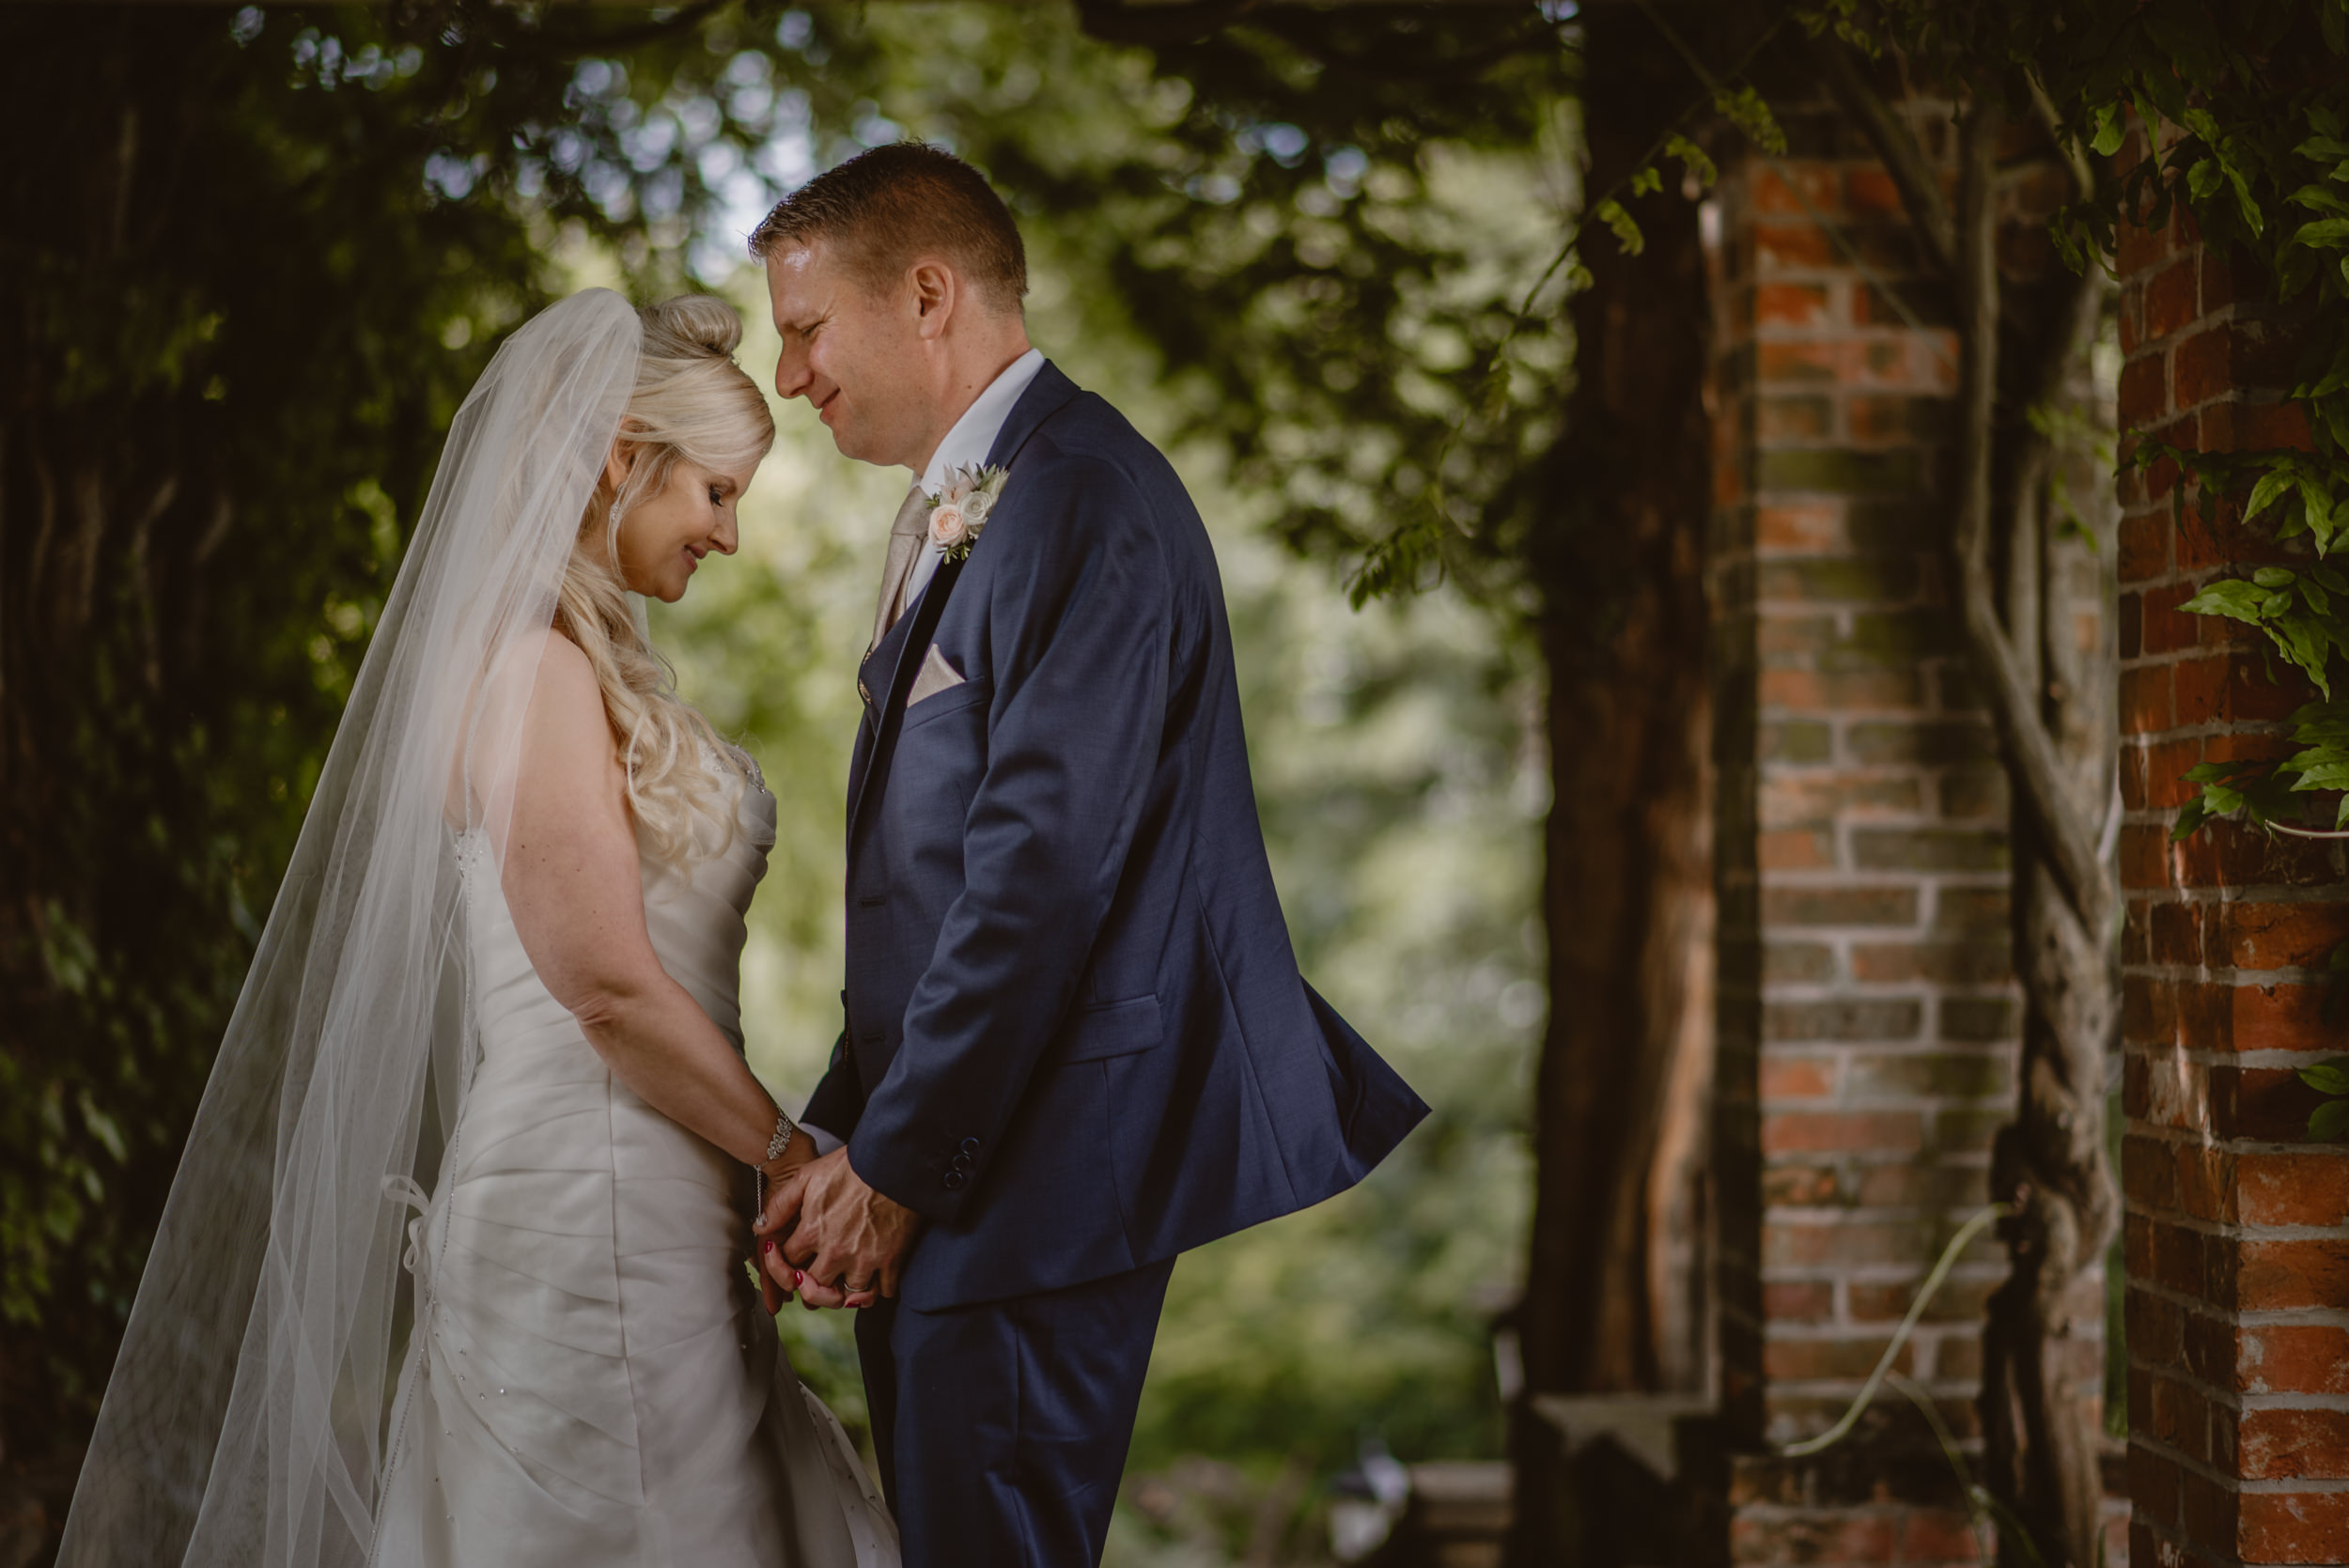 Trisha-and-Roger-wedding-The-Priory-Church-and-Chewton-Glen-Hotel-Christchurch-Manu-Mendoza-Wedding-Photography-320.jpg